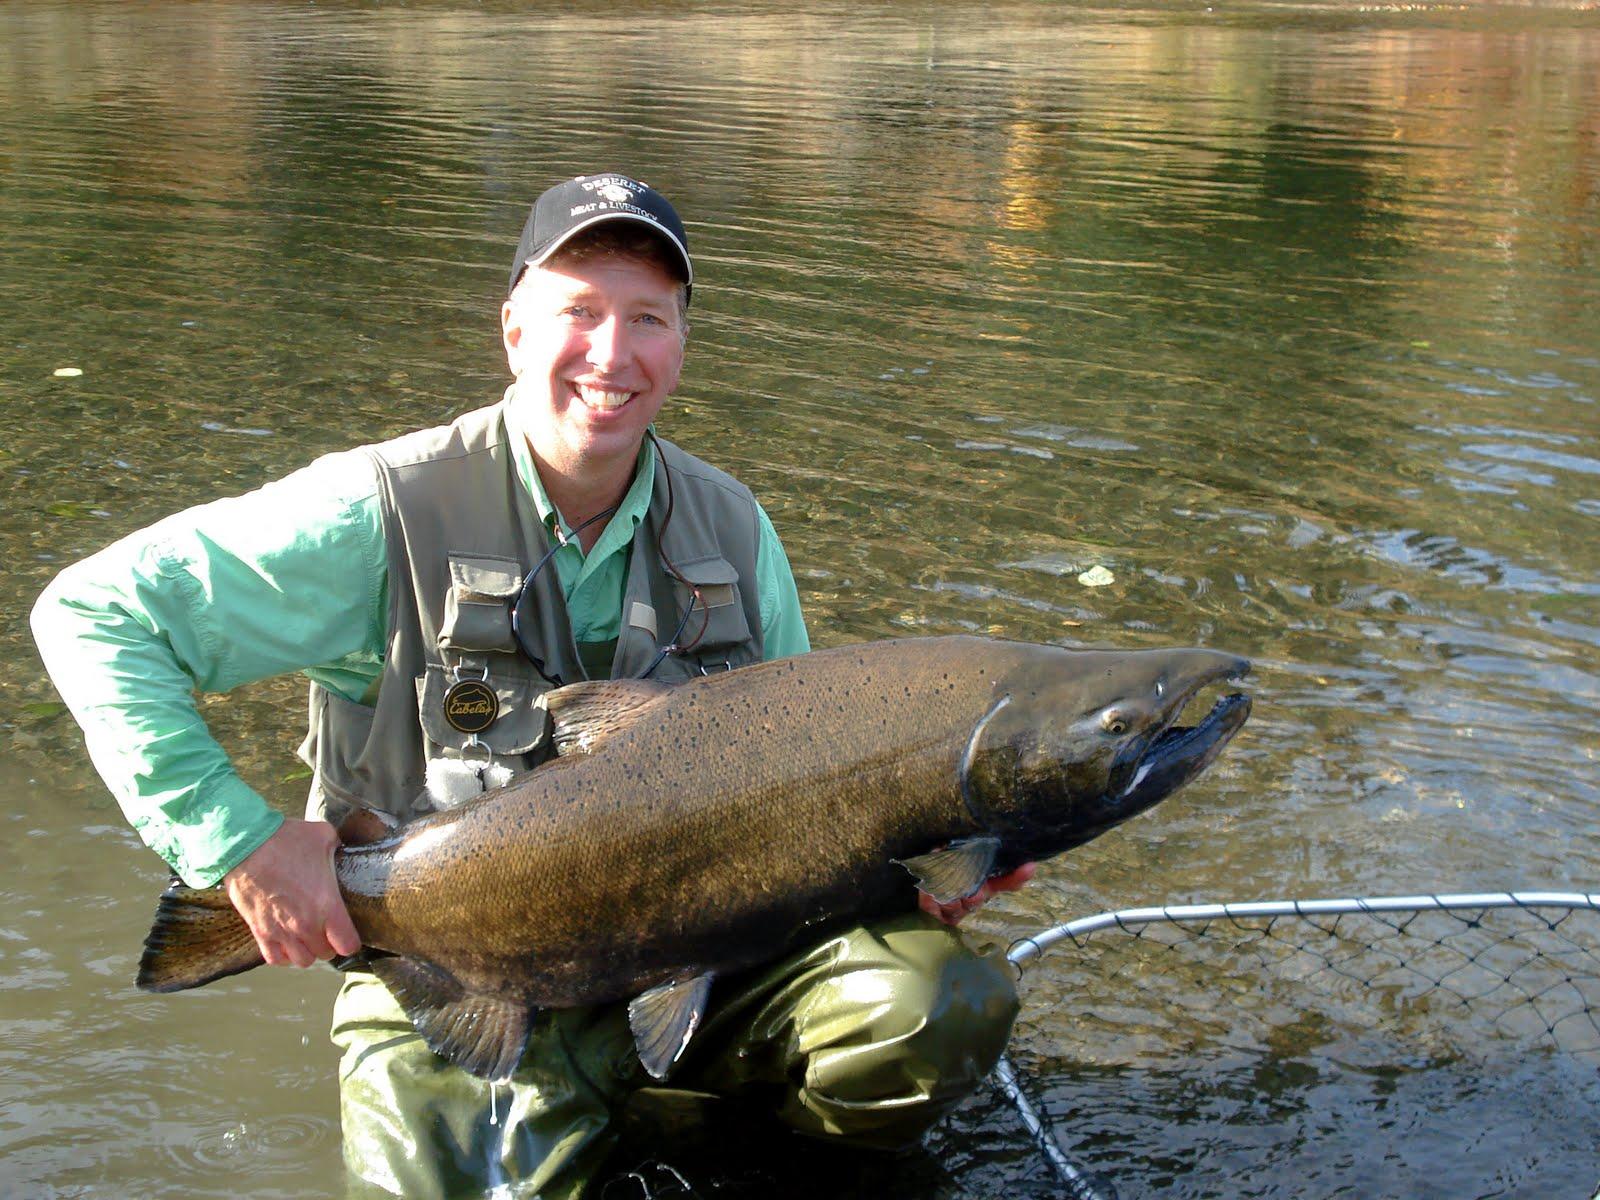 Ricks reel adventures salmon fishing in washington for Salmon fishing washington